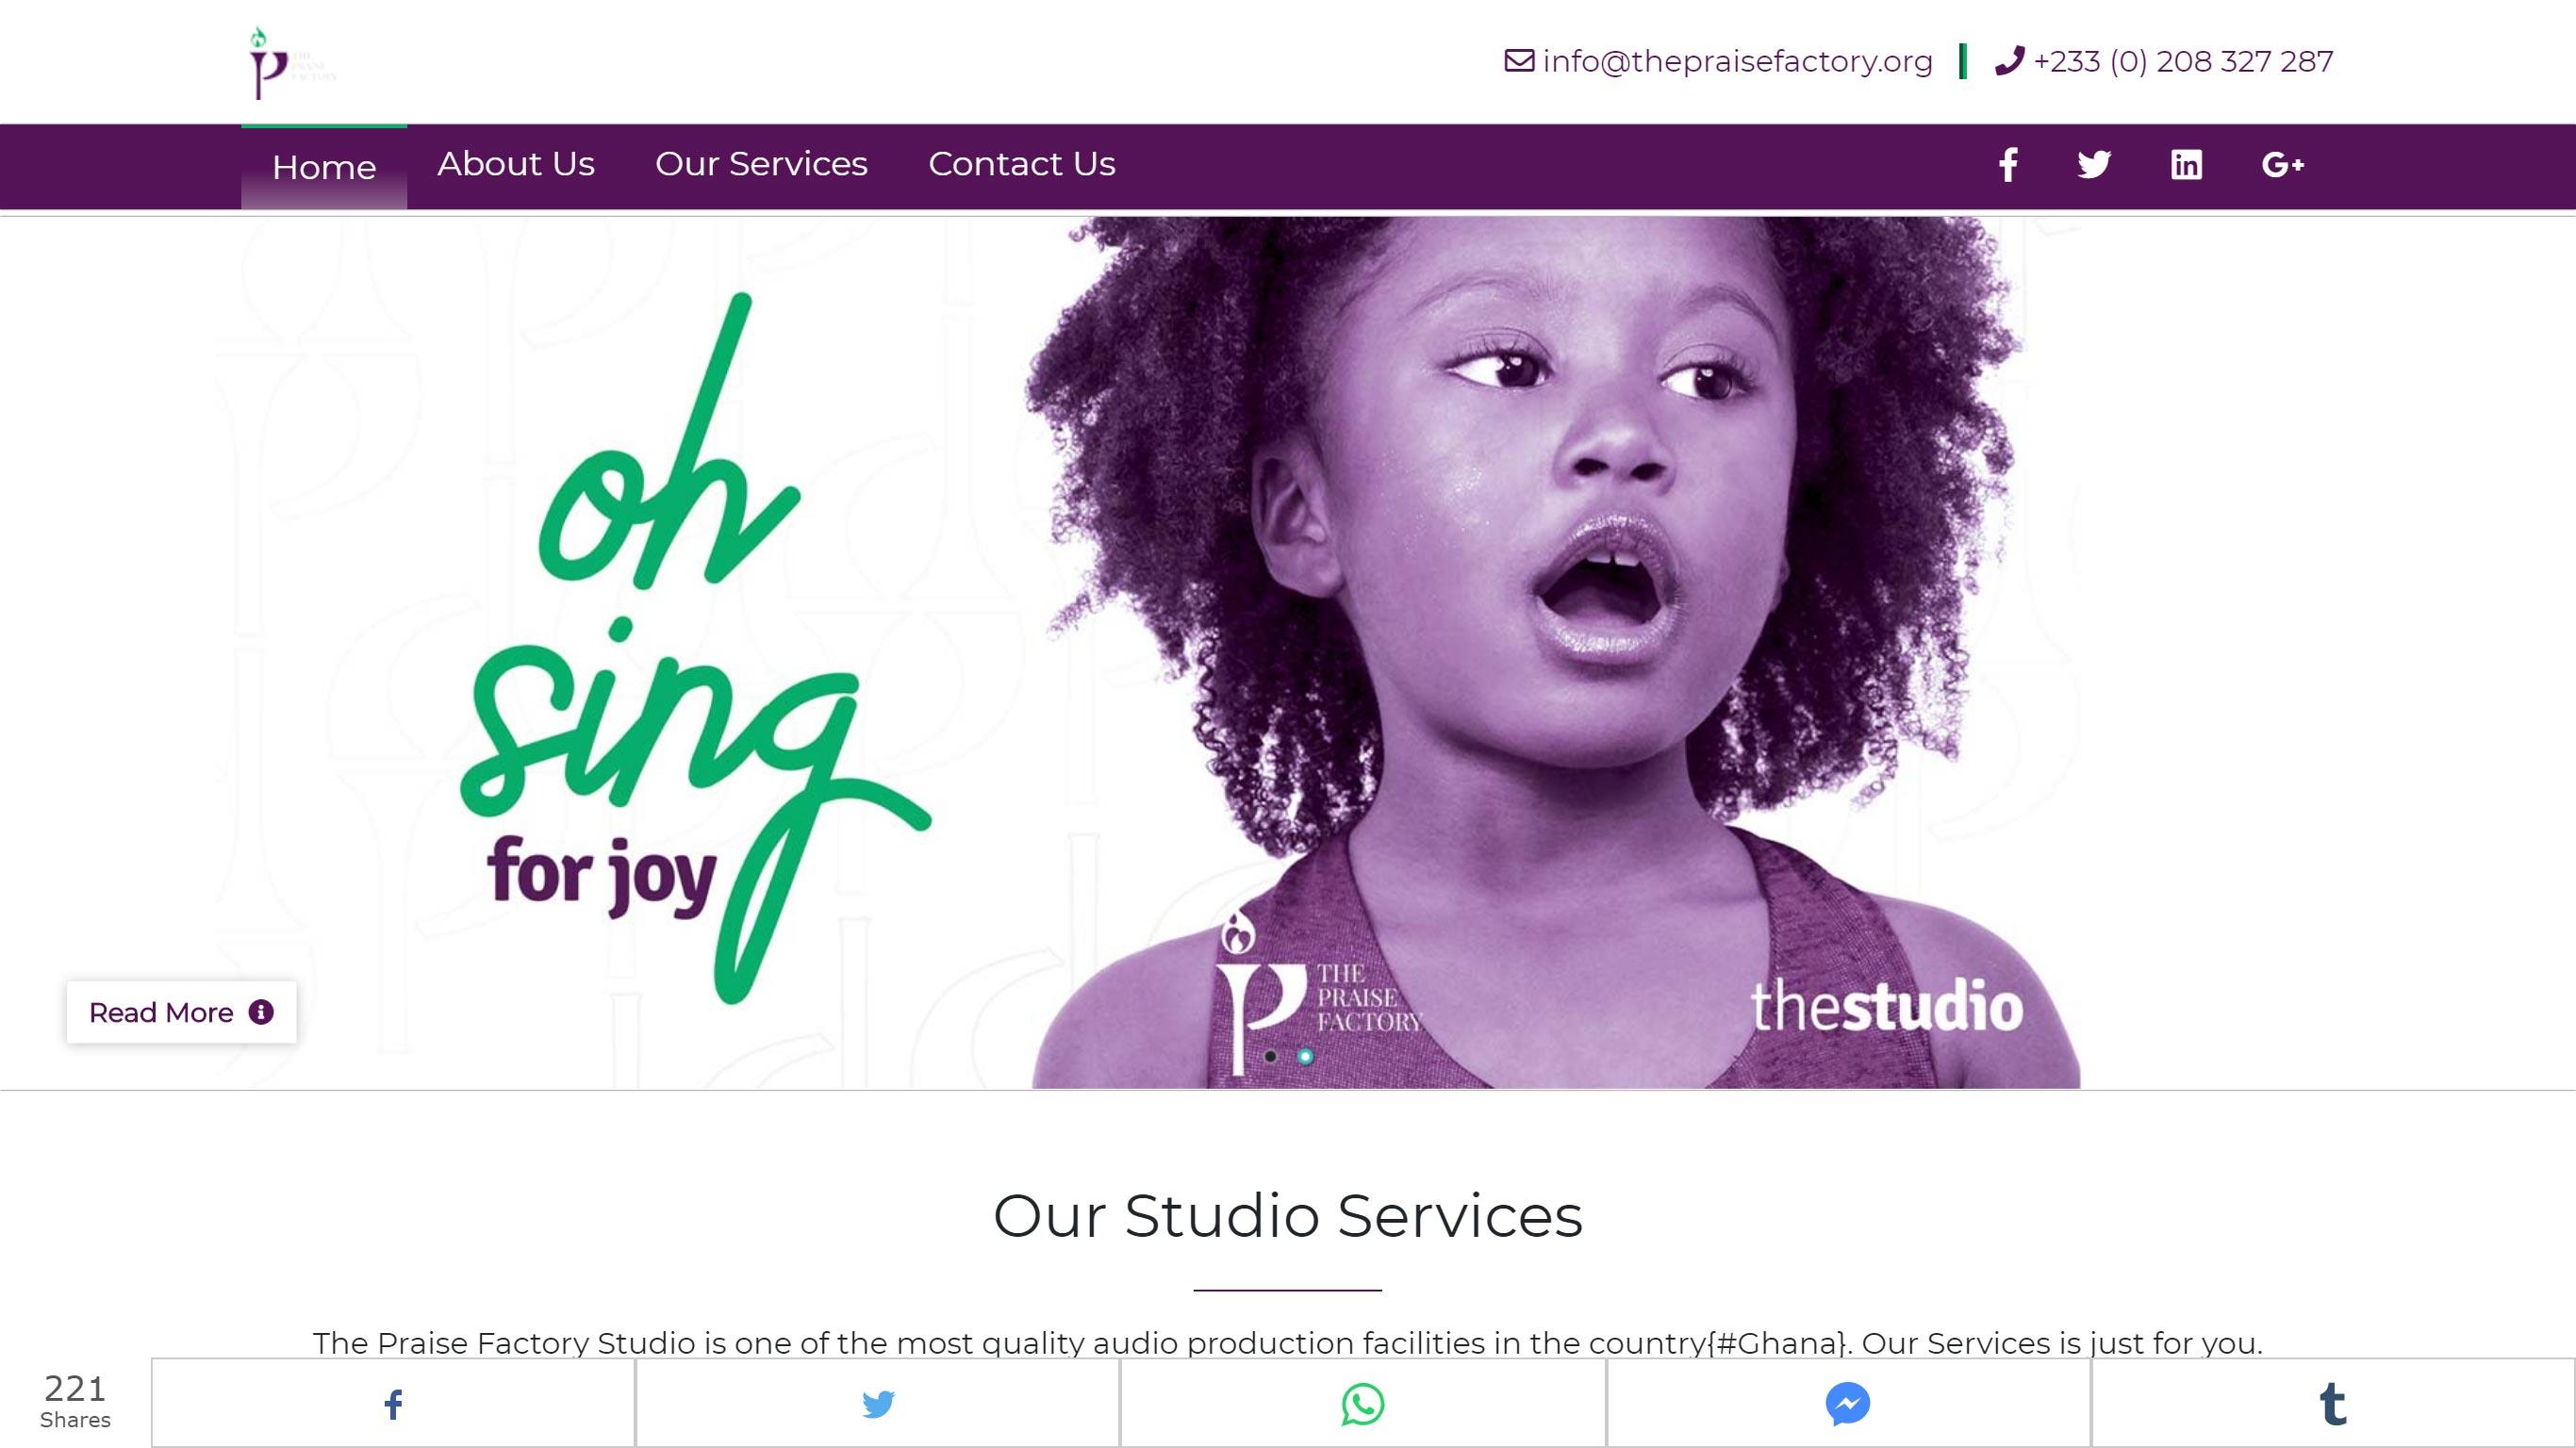 The Praise Factory Studio